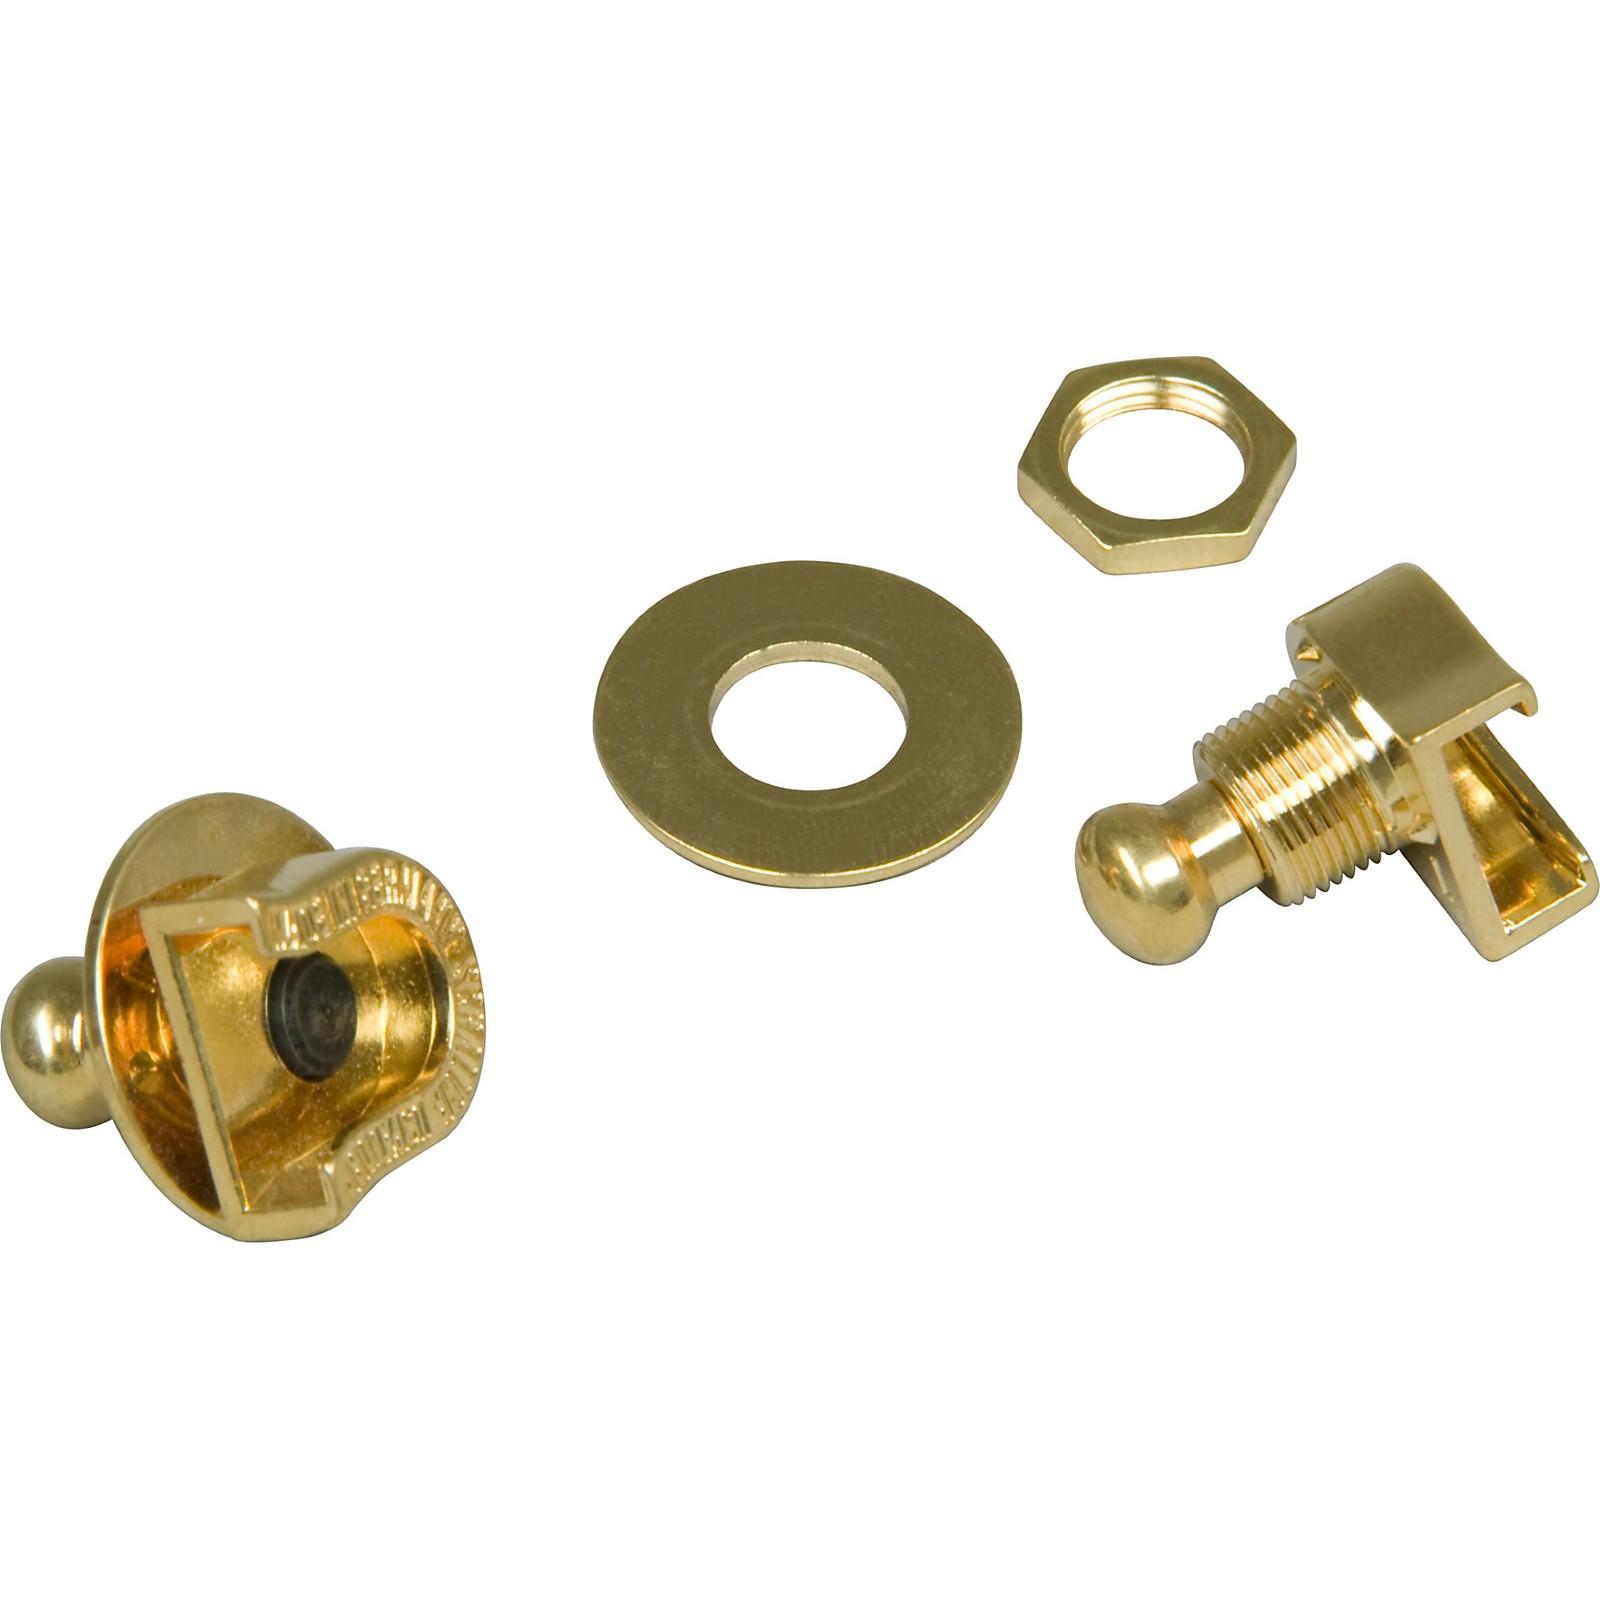 Proline Strap Lock Gold